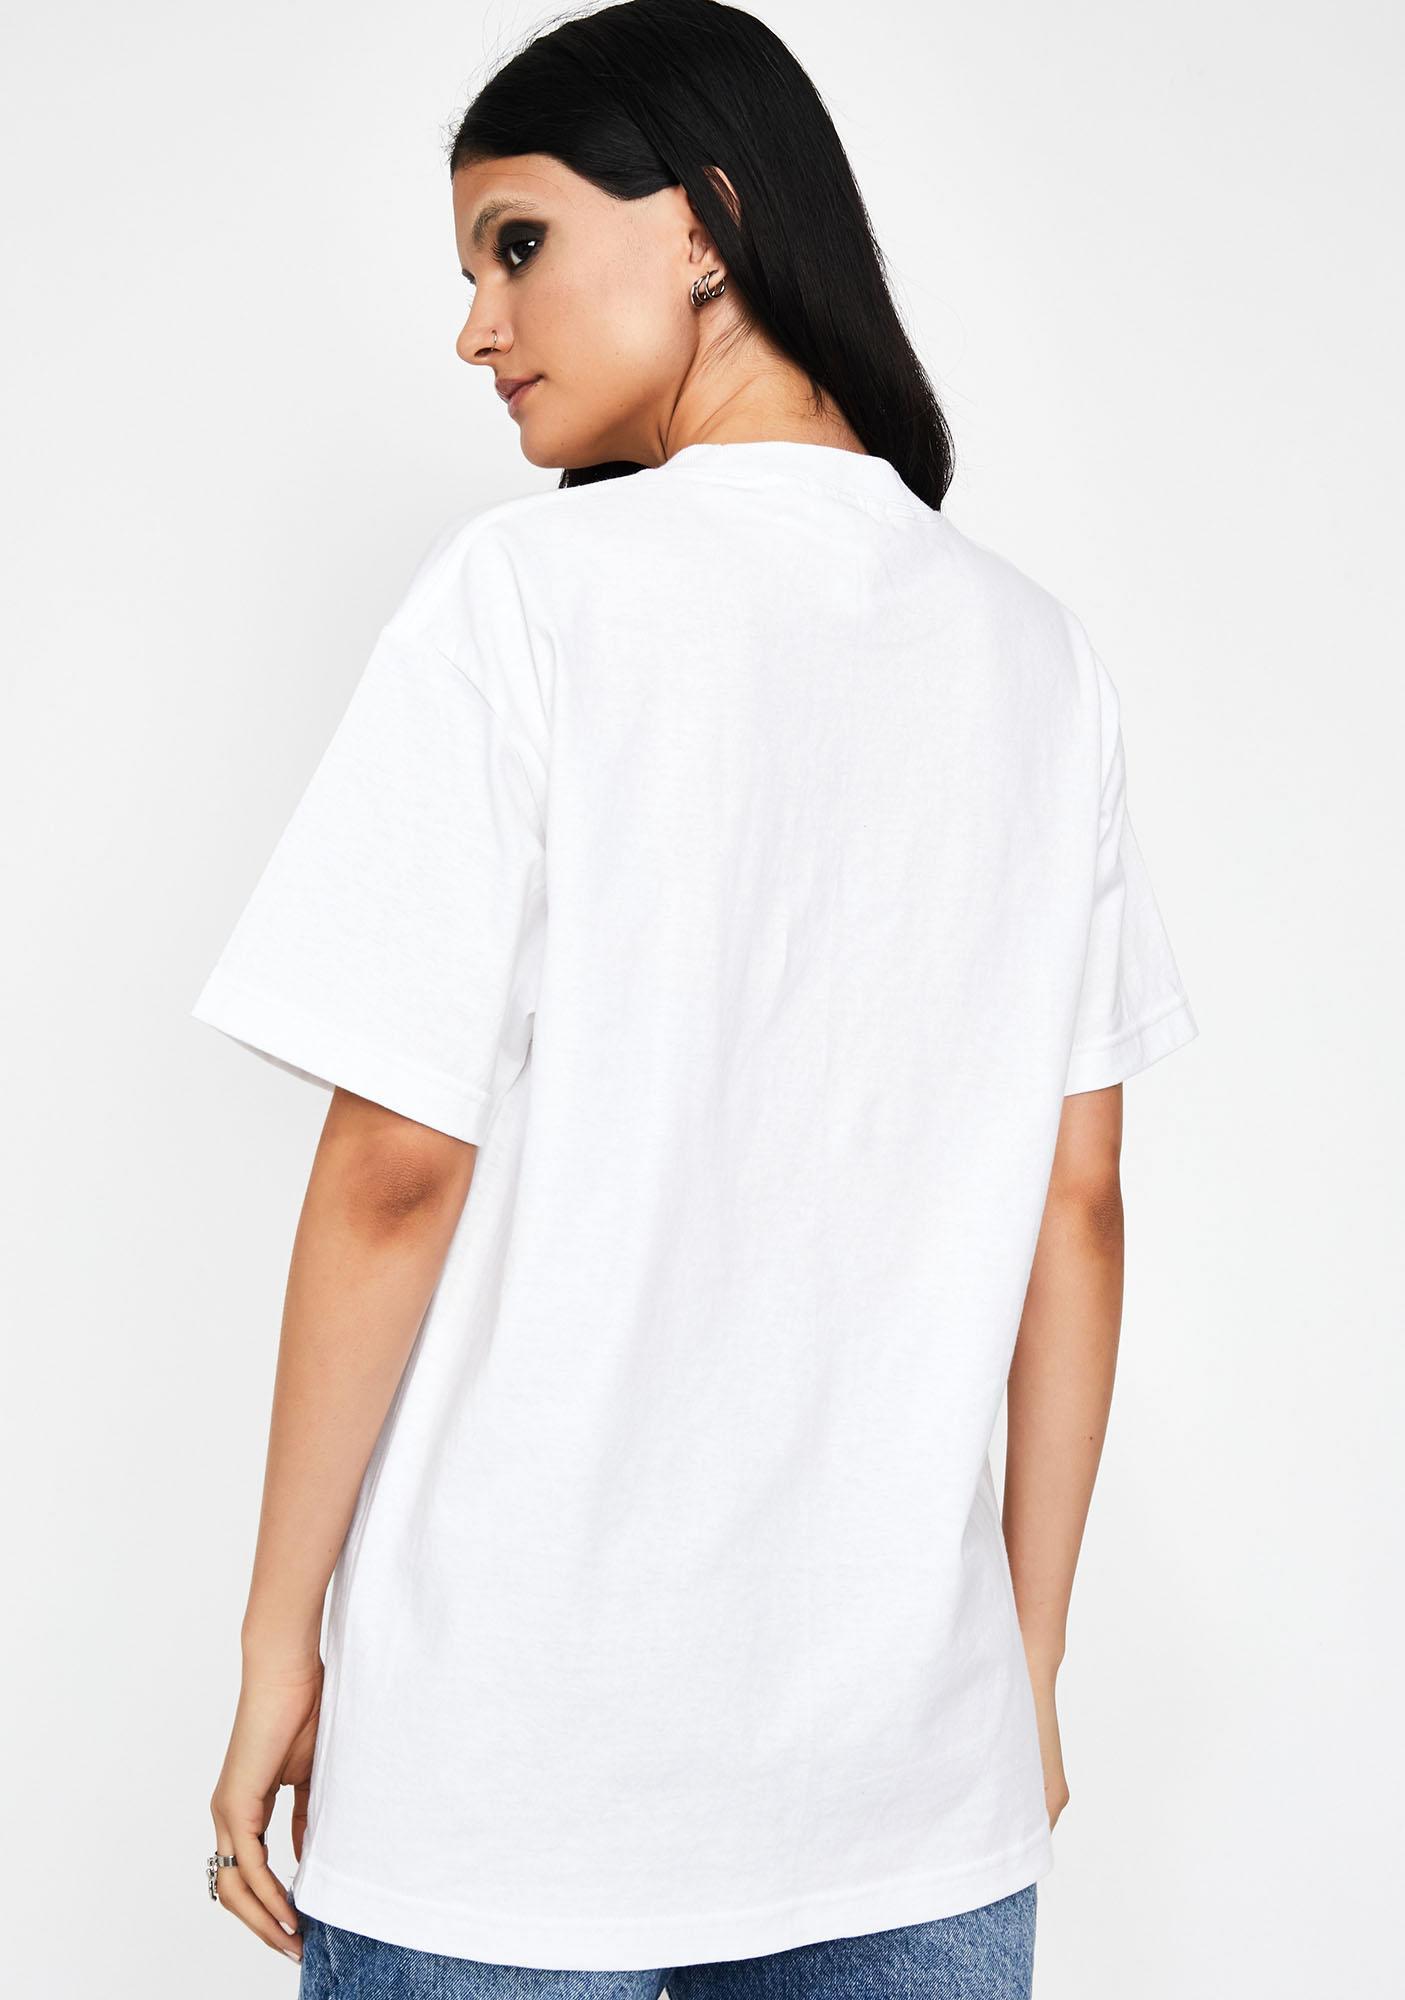 Free The Nips T-Shirt